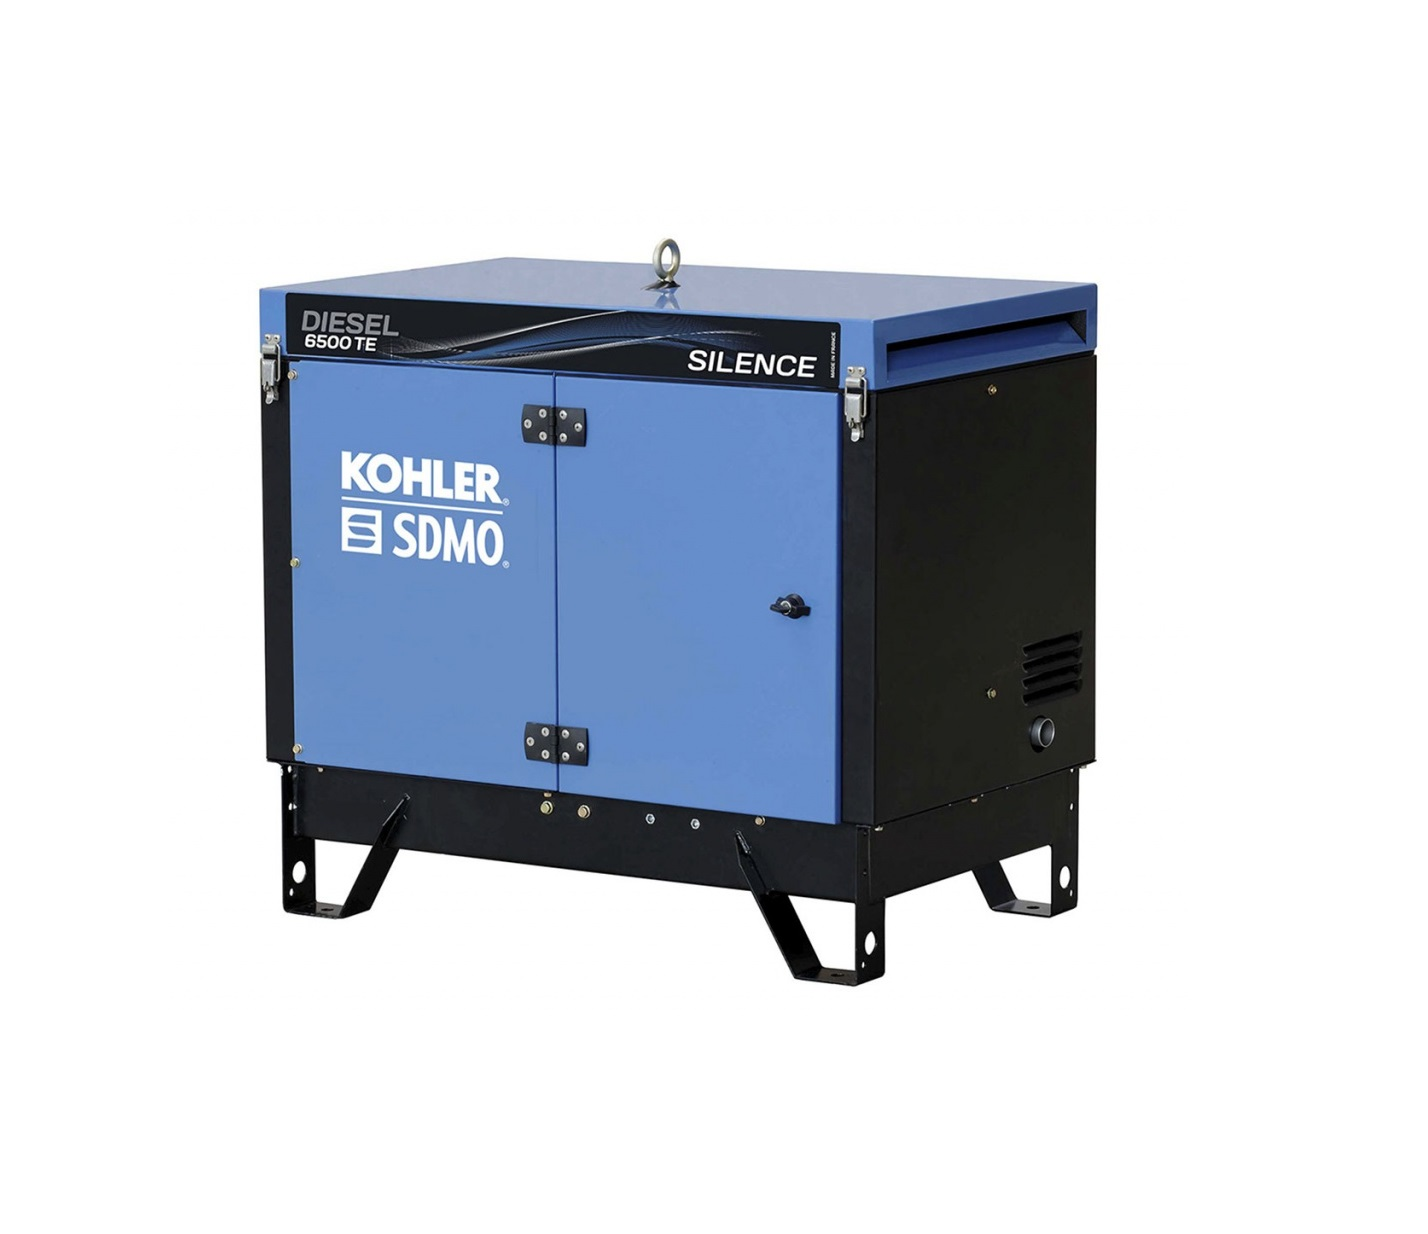 Дизельный генератор (электростанция) SDMO DIESEL 6500 TE AVR SILENCE